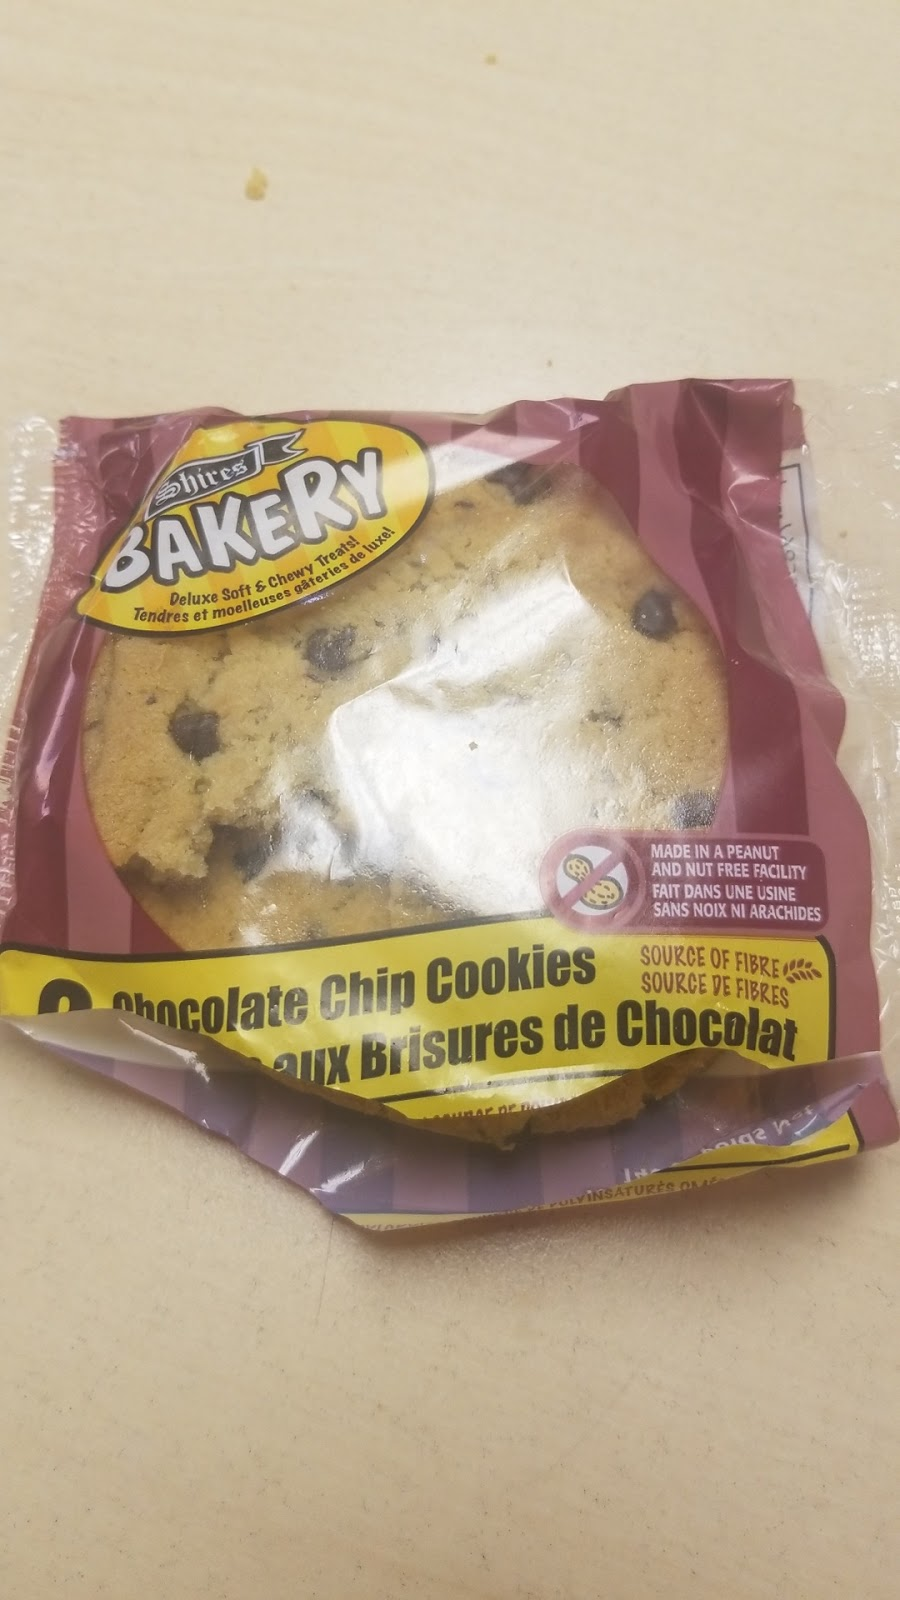 Shires Bakery | bakery | 15 Lyndhurst Street, Hamilton, ON L8L 7G6, Canada | 9053834066 OR +1 905-383-4066